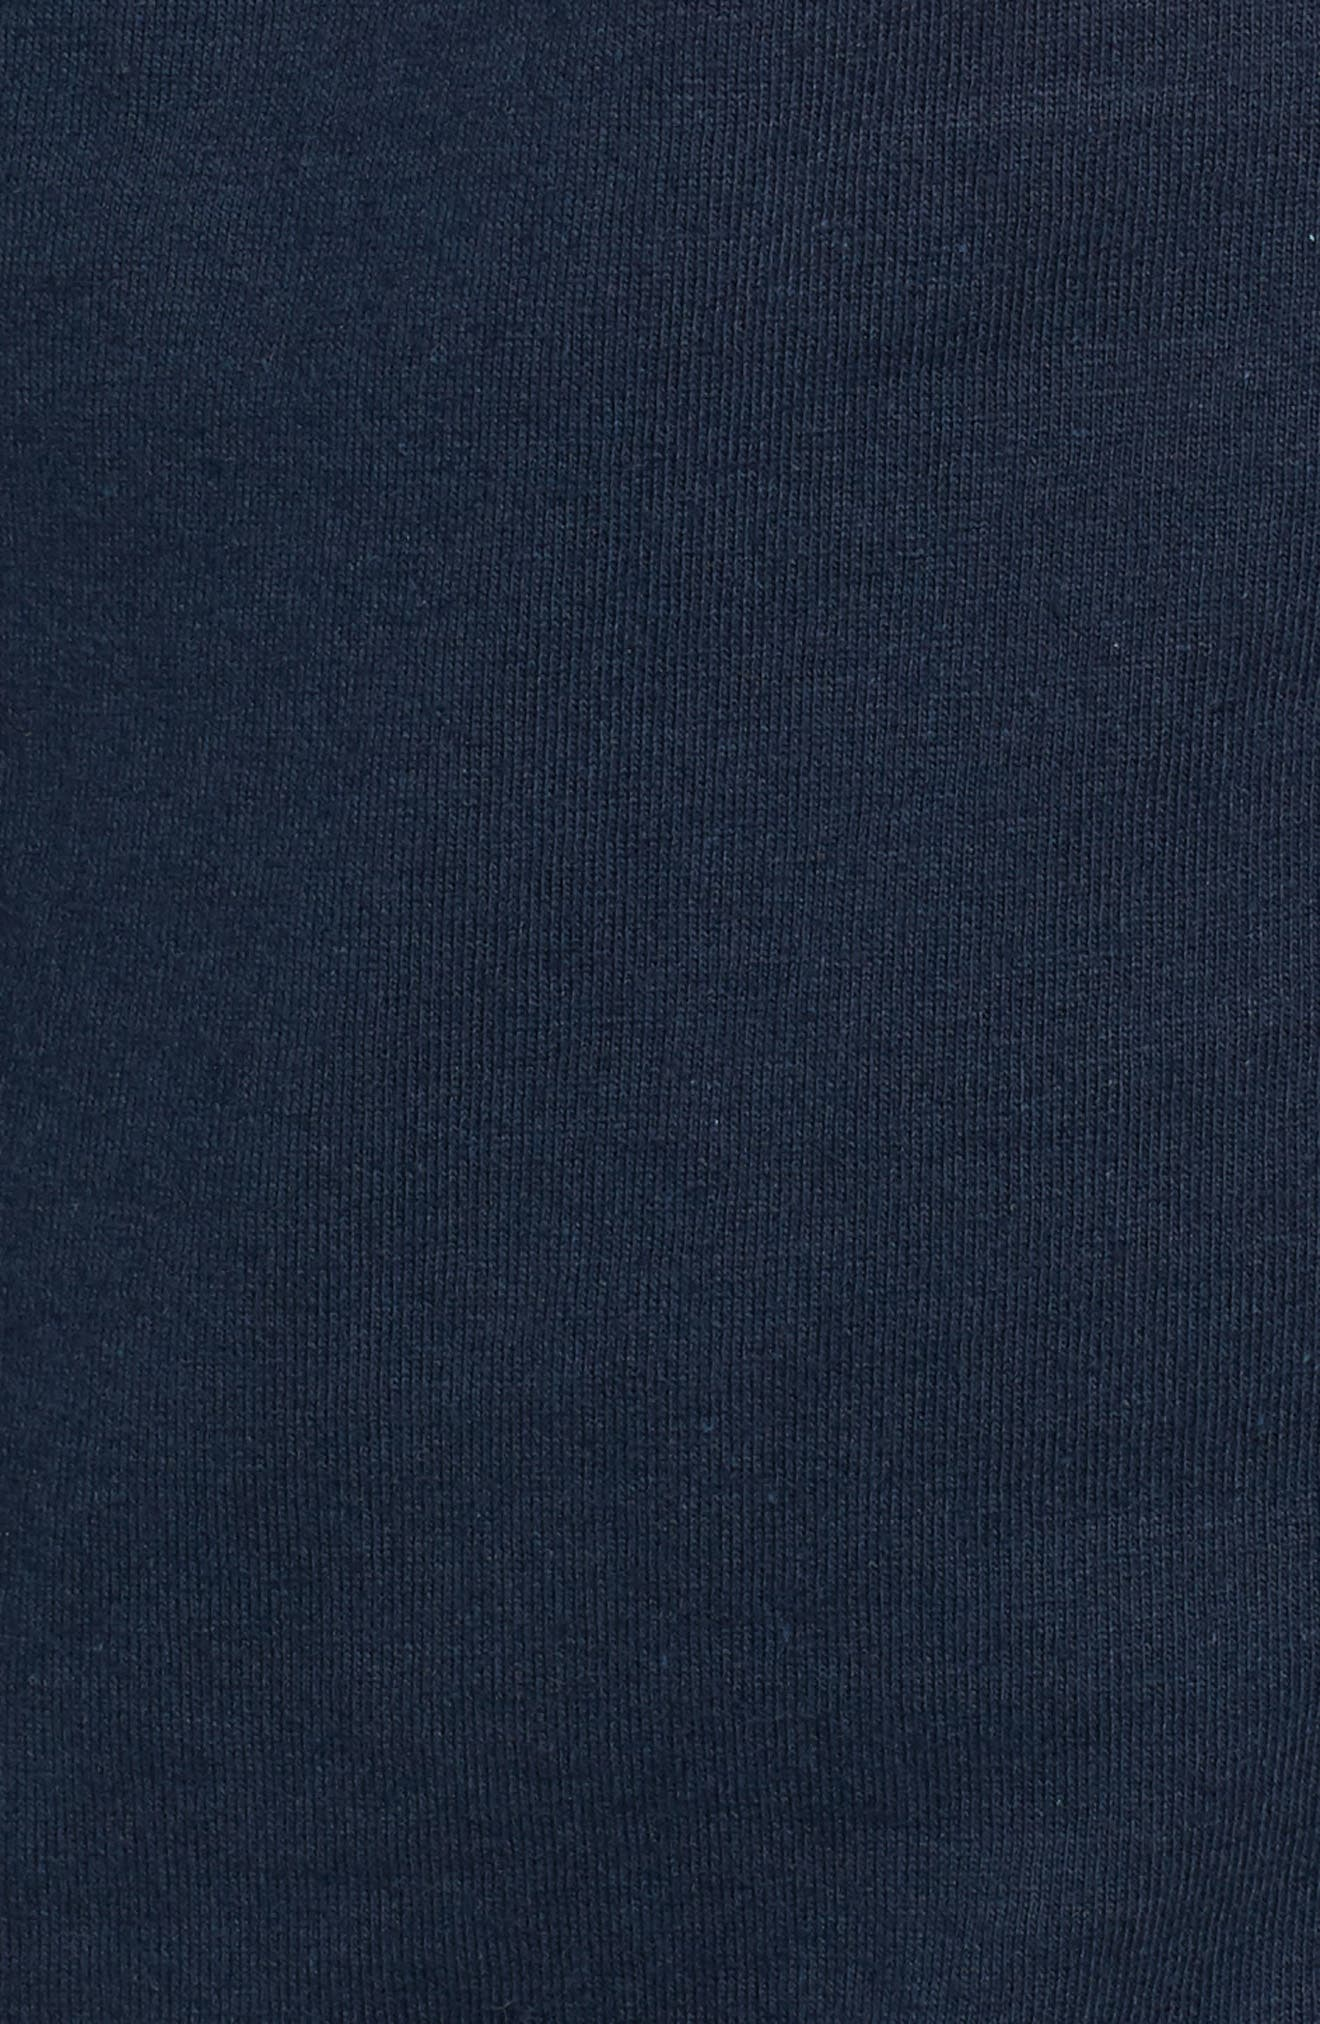 Rexton Graphic T-Shirt,                             Alternate thumbnail 5, color,                             410